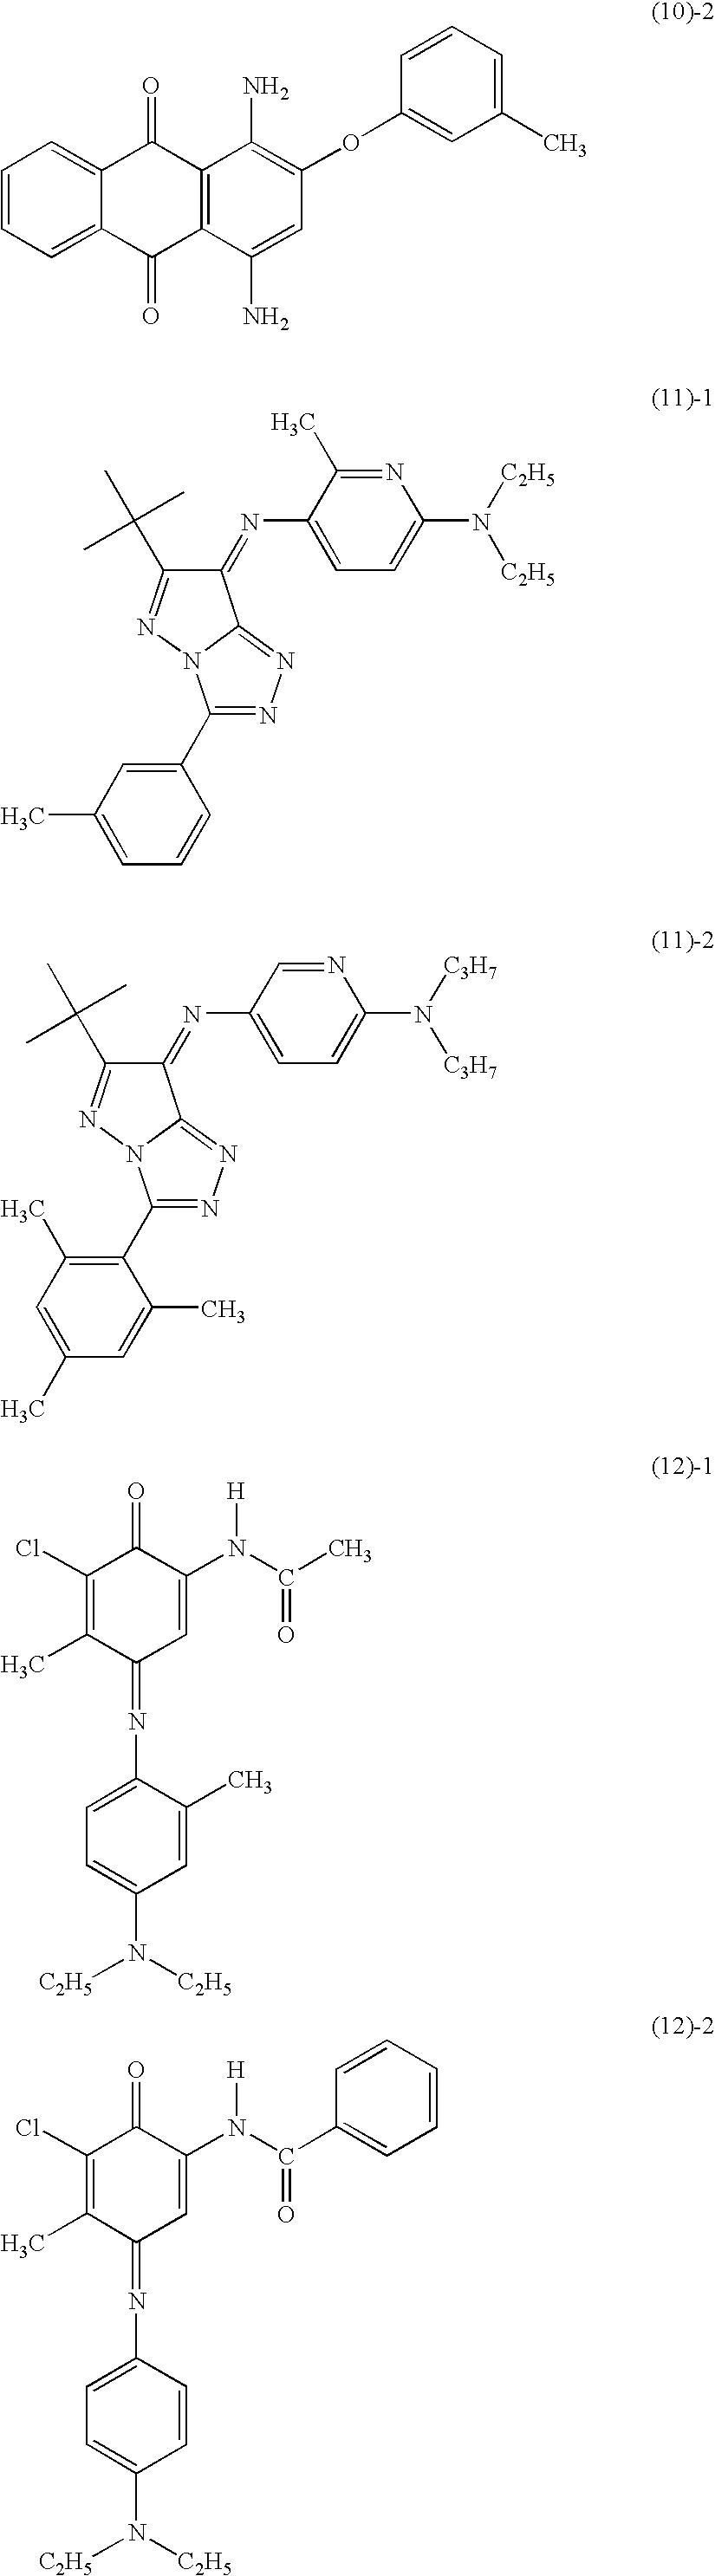 Us20070212635a1 Image Forming Method Using Heat Sensitive Transfer Kazuma 124 Cm3 Wiring Diagram Figure 20070913 C00005